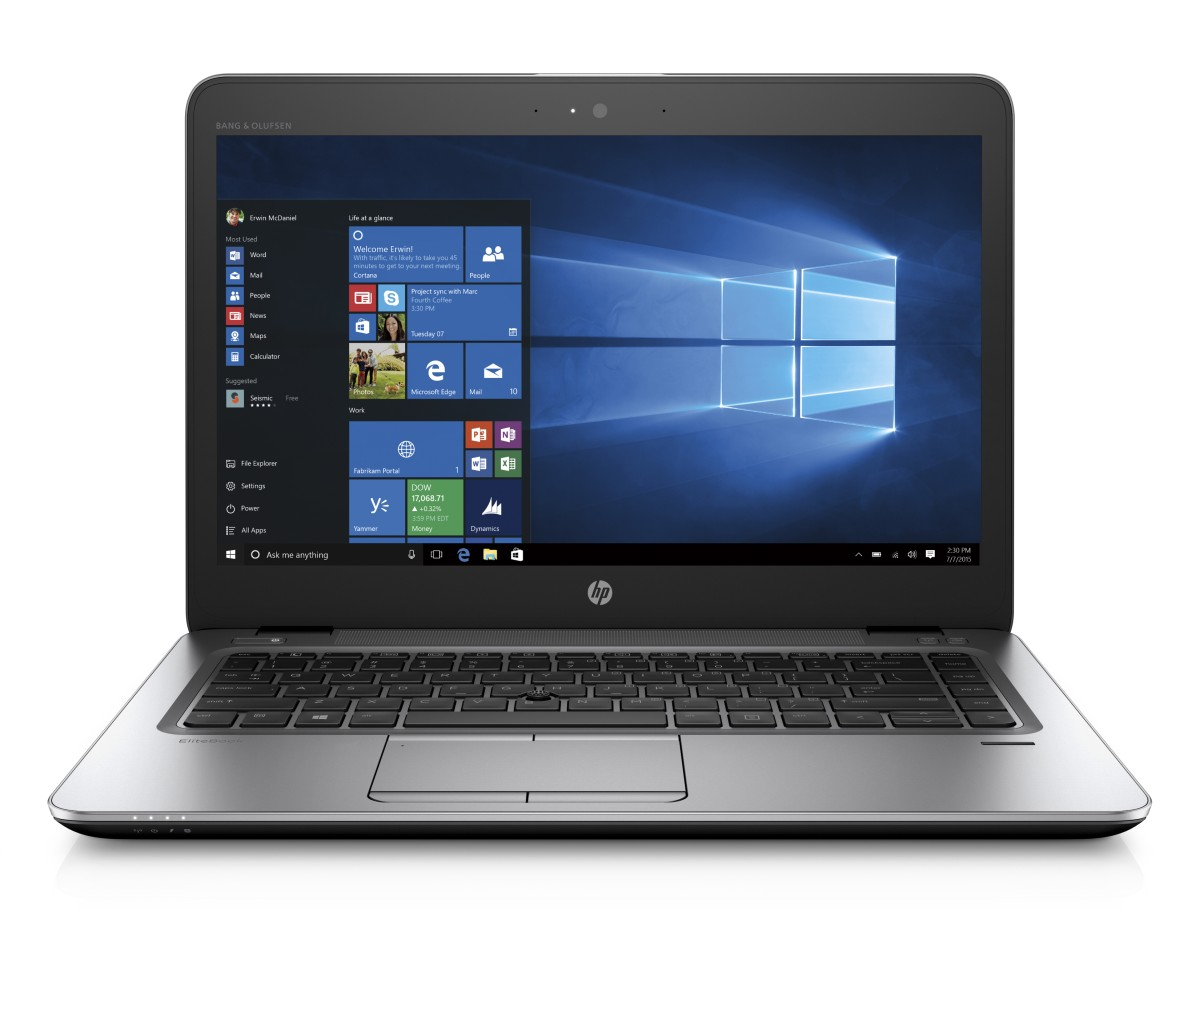 HP EliteBook 840 G4 i7-7500U 14 FHD CAM, 8GB, 512GB TurboG2+volny slot 2,5, ac, BT, FpR, backlit kbd, Win10Pro